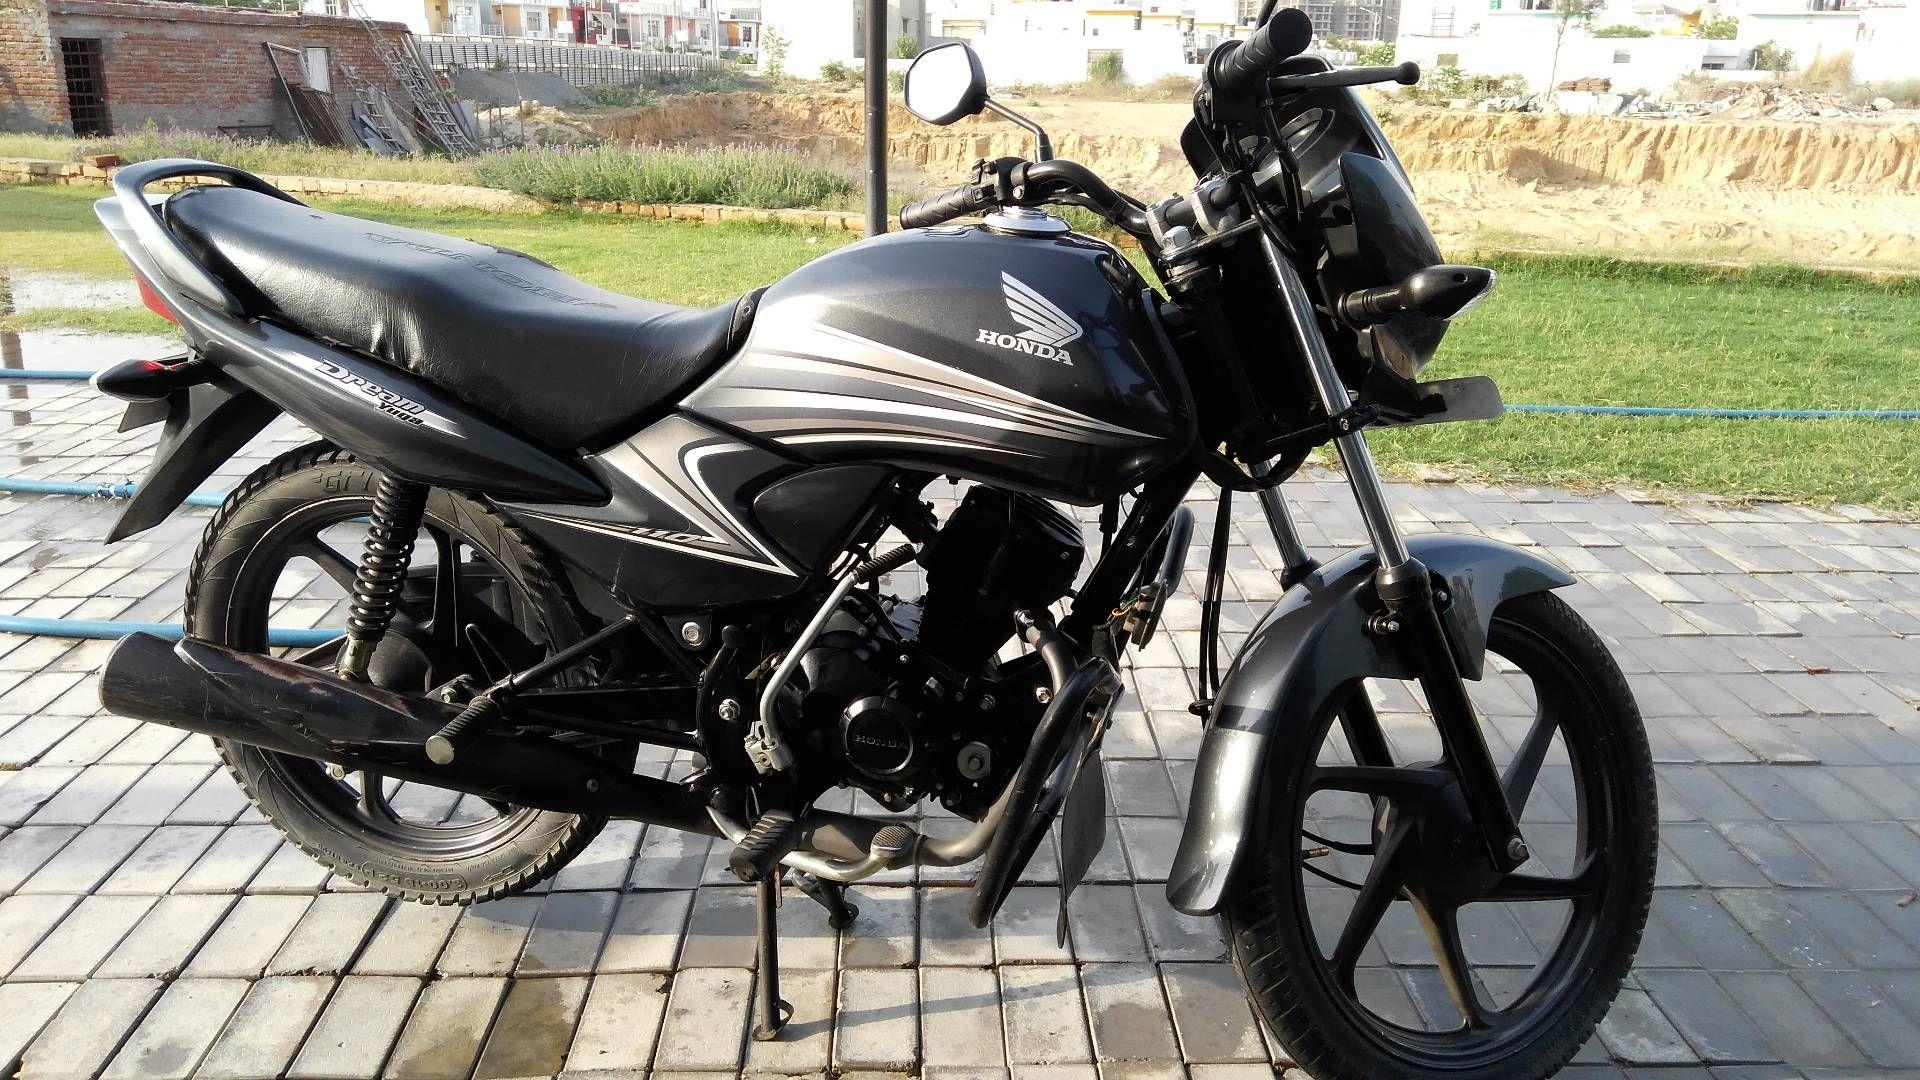 Honda Dream Yuga 2013 Model Bike From Lucknow Check Below For More Details Http Dreamwheels In Buy Used Bikes 392 Honda Dr Used Bikes Honda 2013 Honda